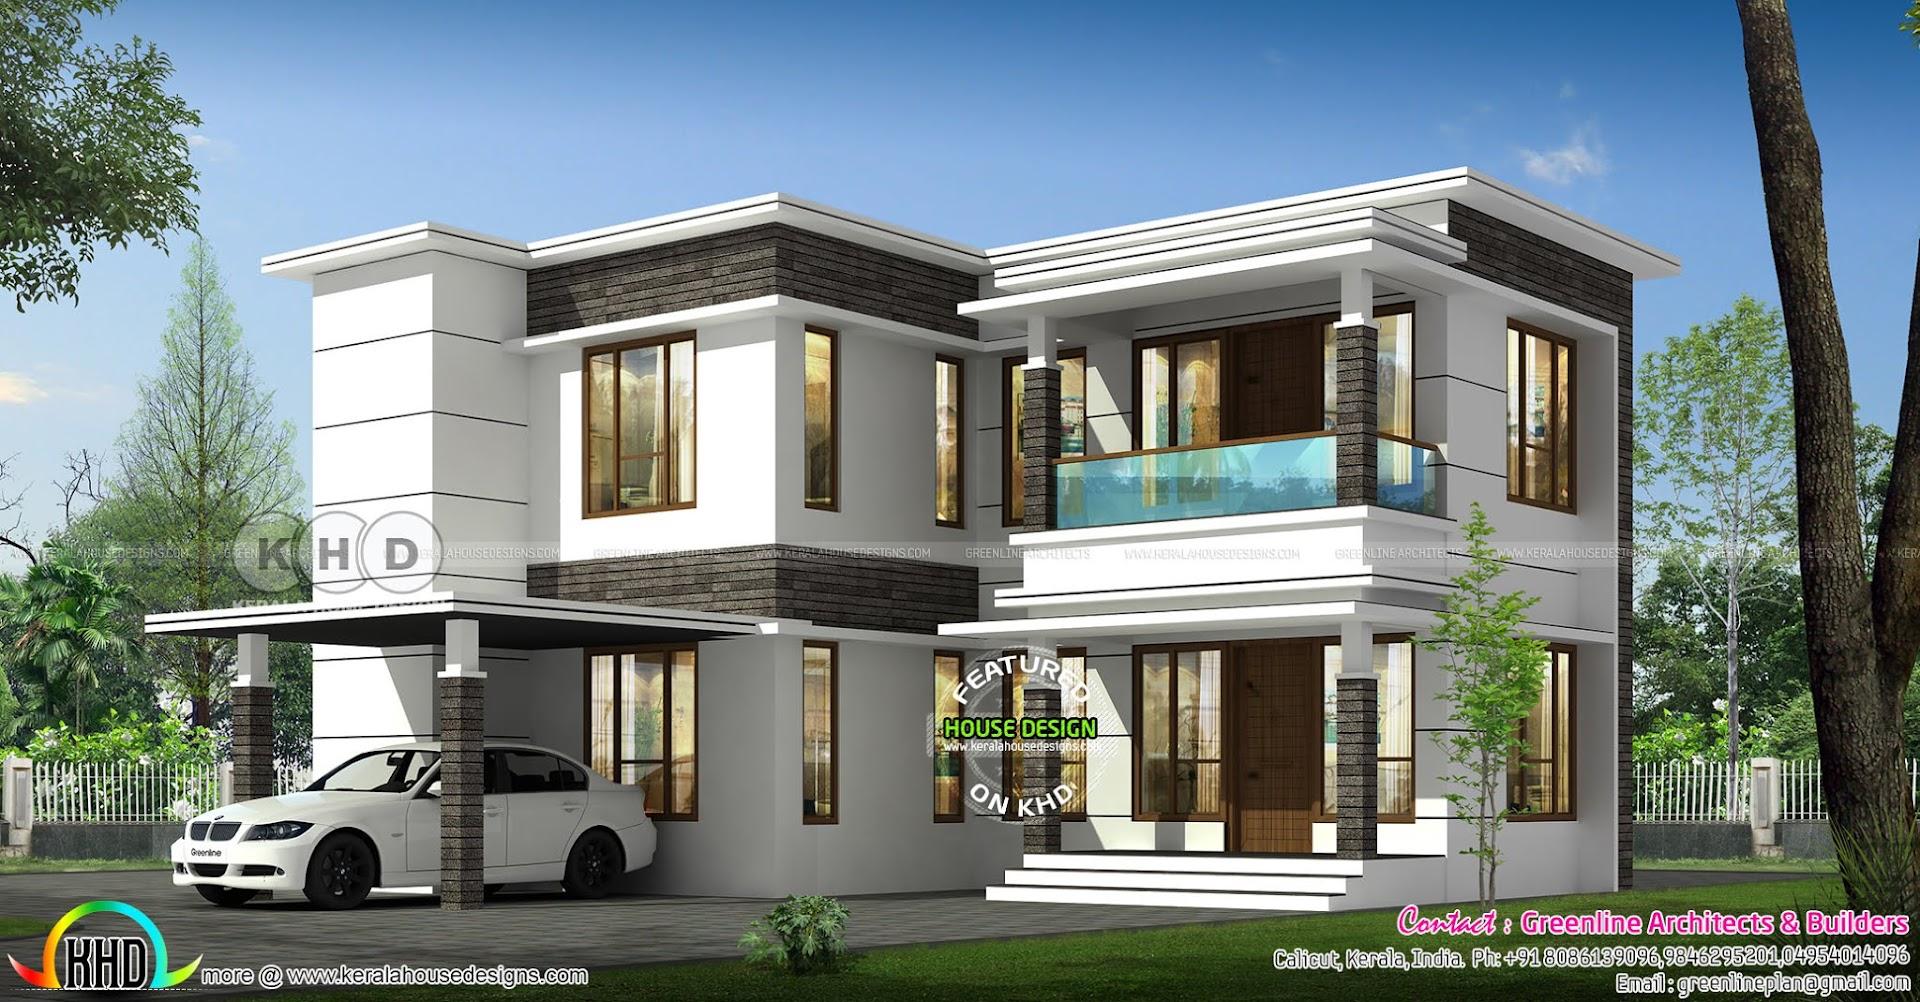 1981 Sq Ft 4 Bedroom Modern Flat Roof House Kerala Home Design Bloglovin